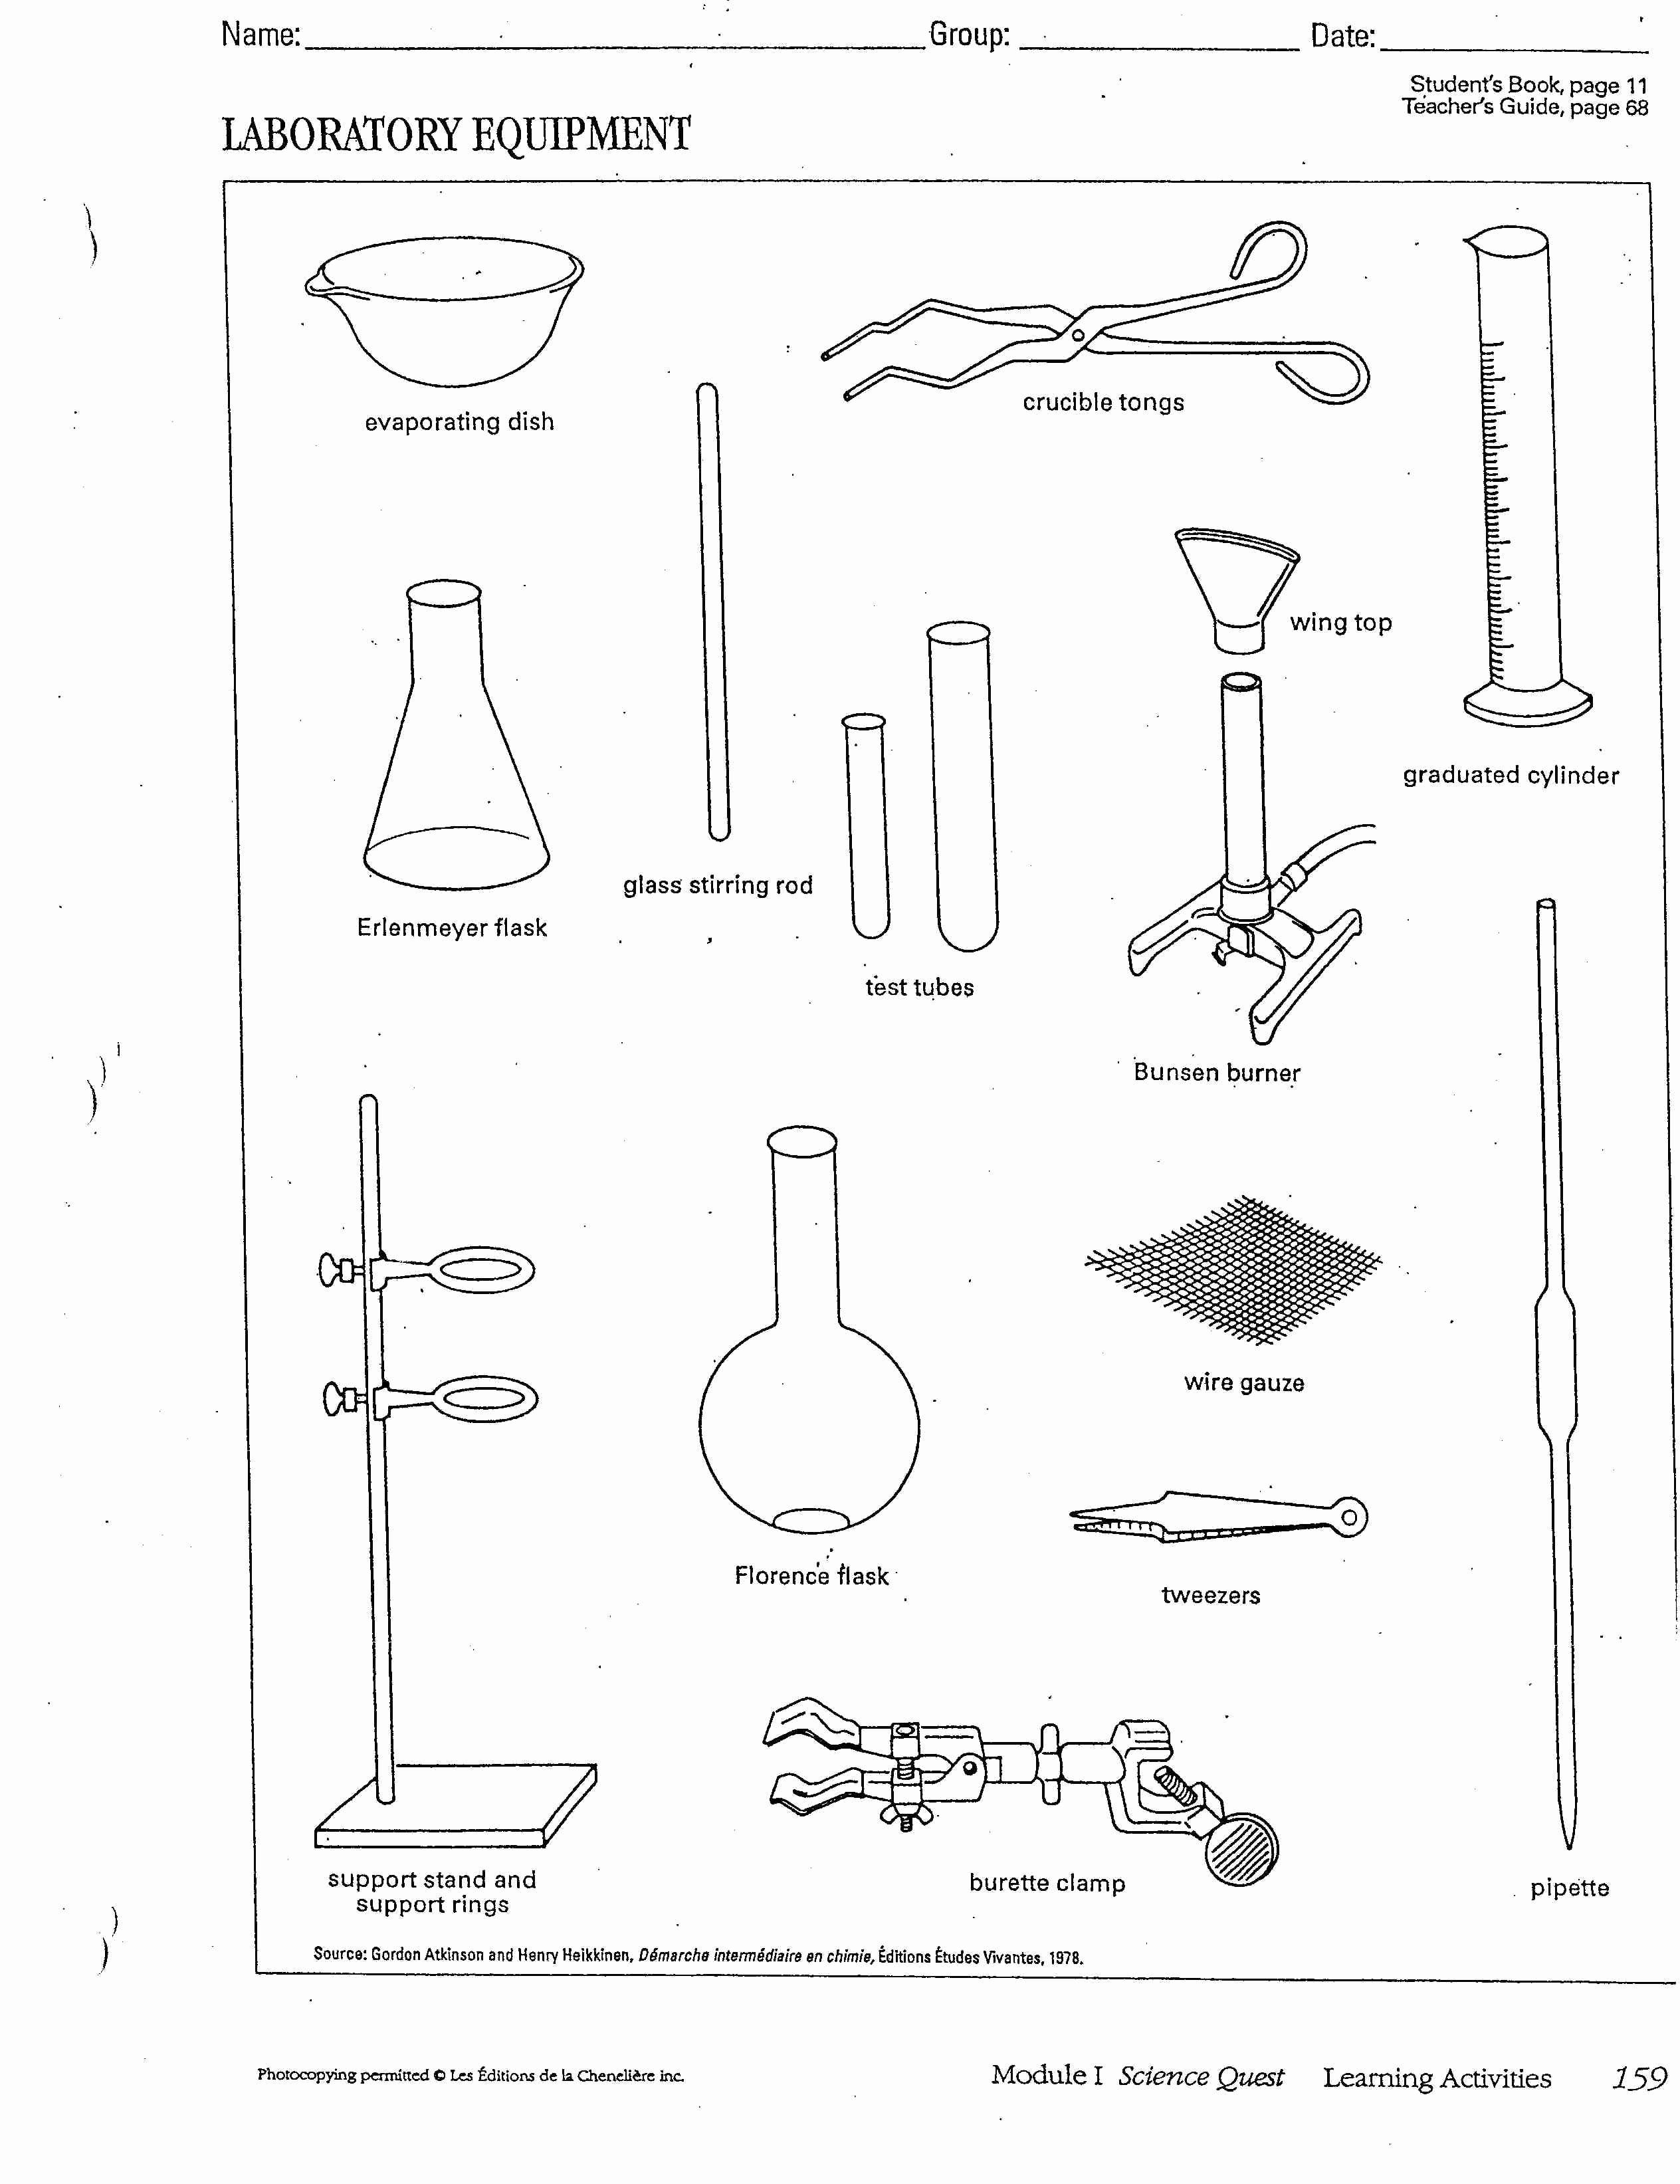 Lab Equipment Worksheet Answer Best Of Chemistry Lab Equipment Bing